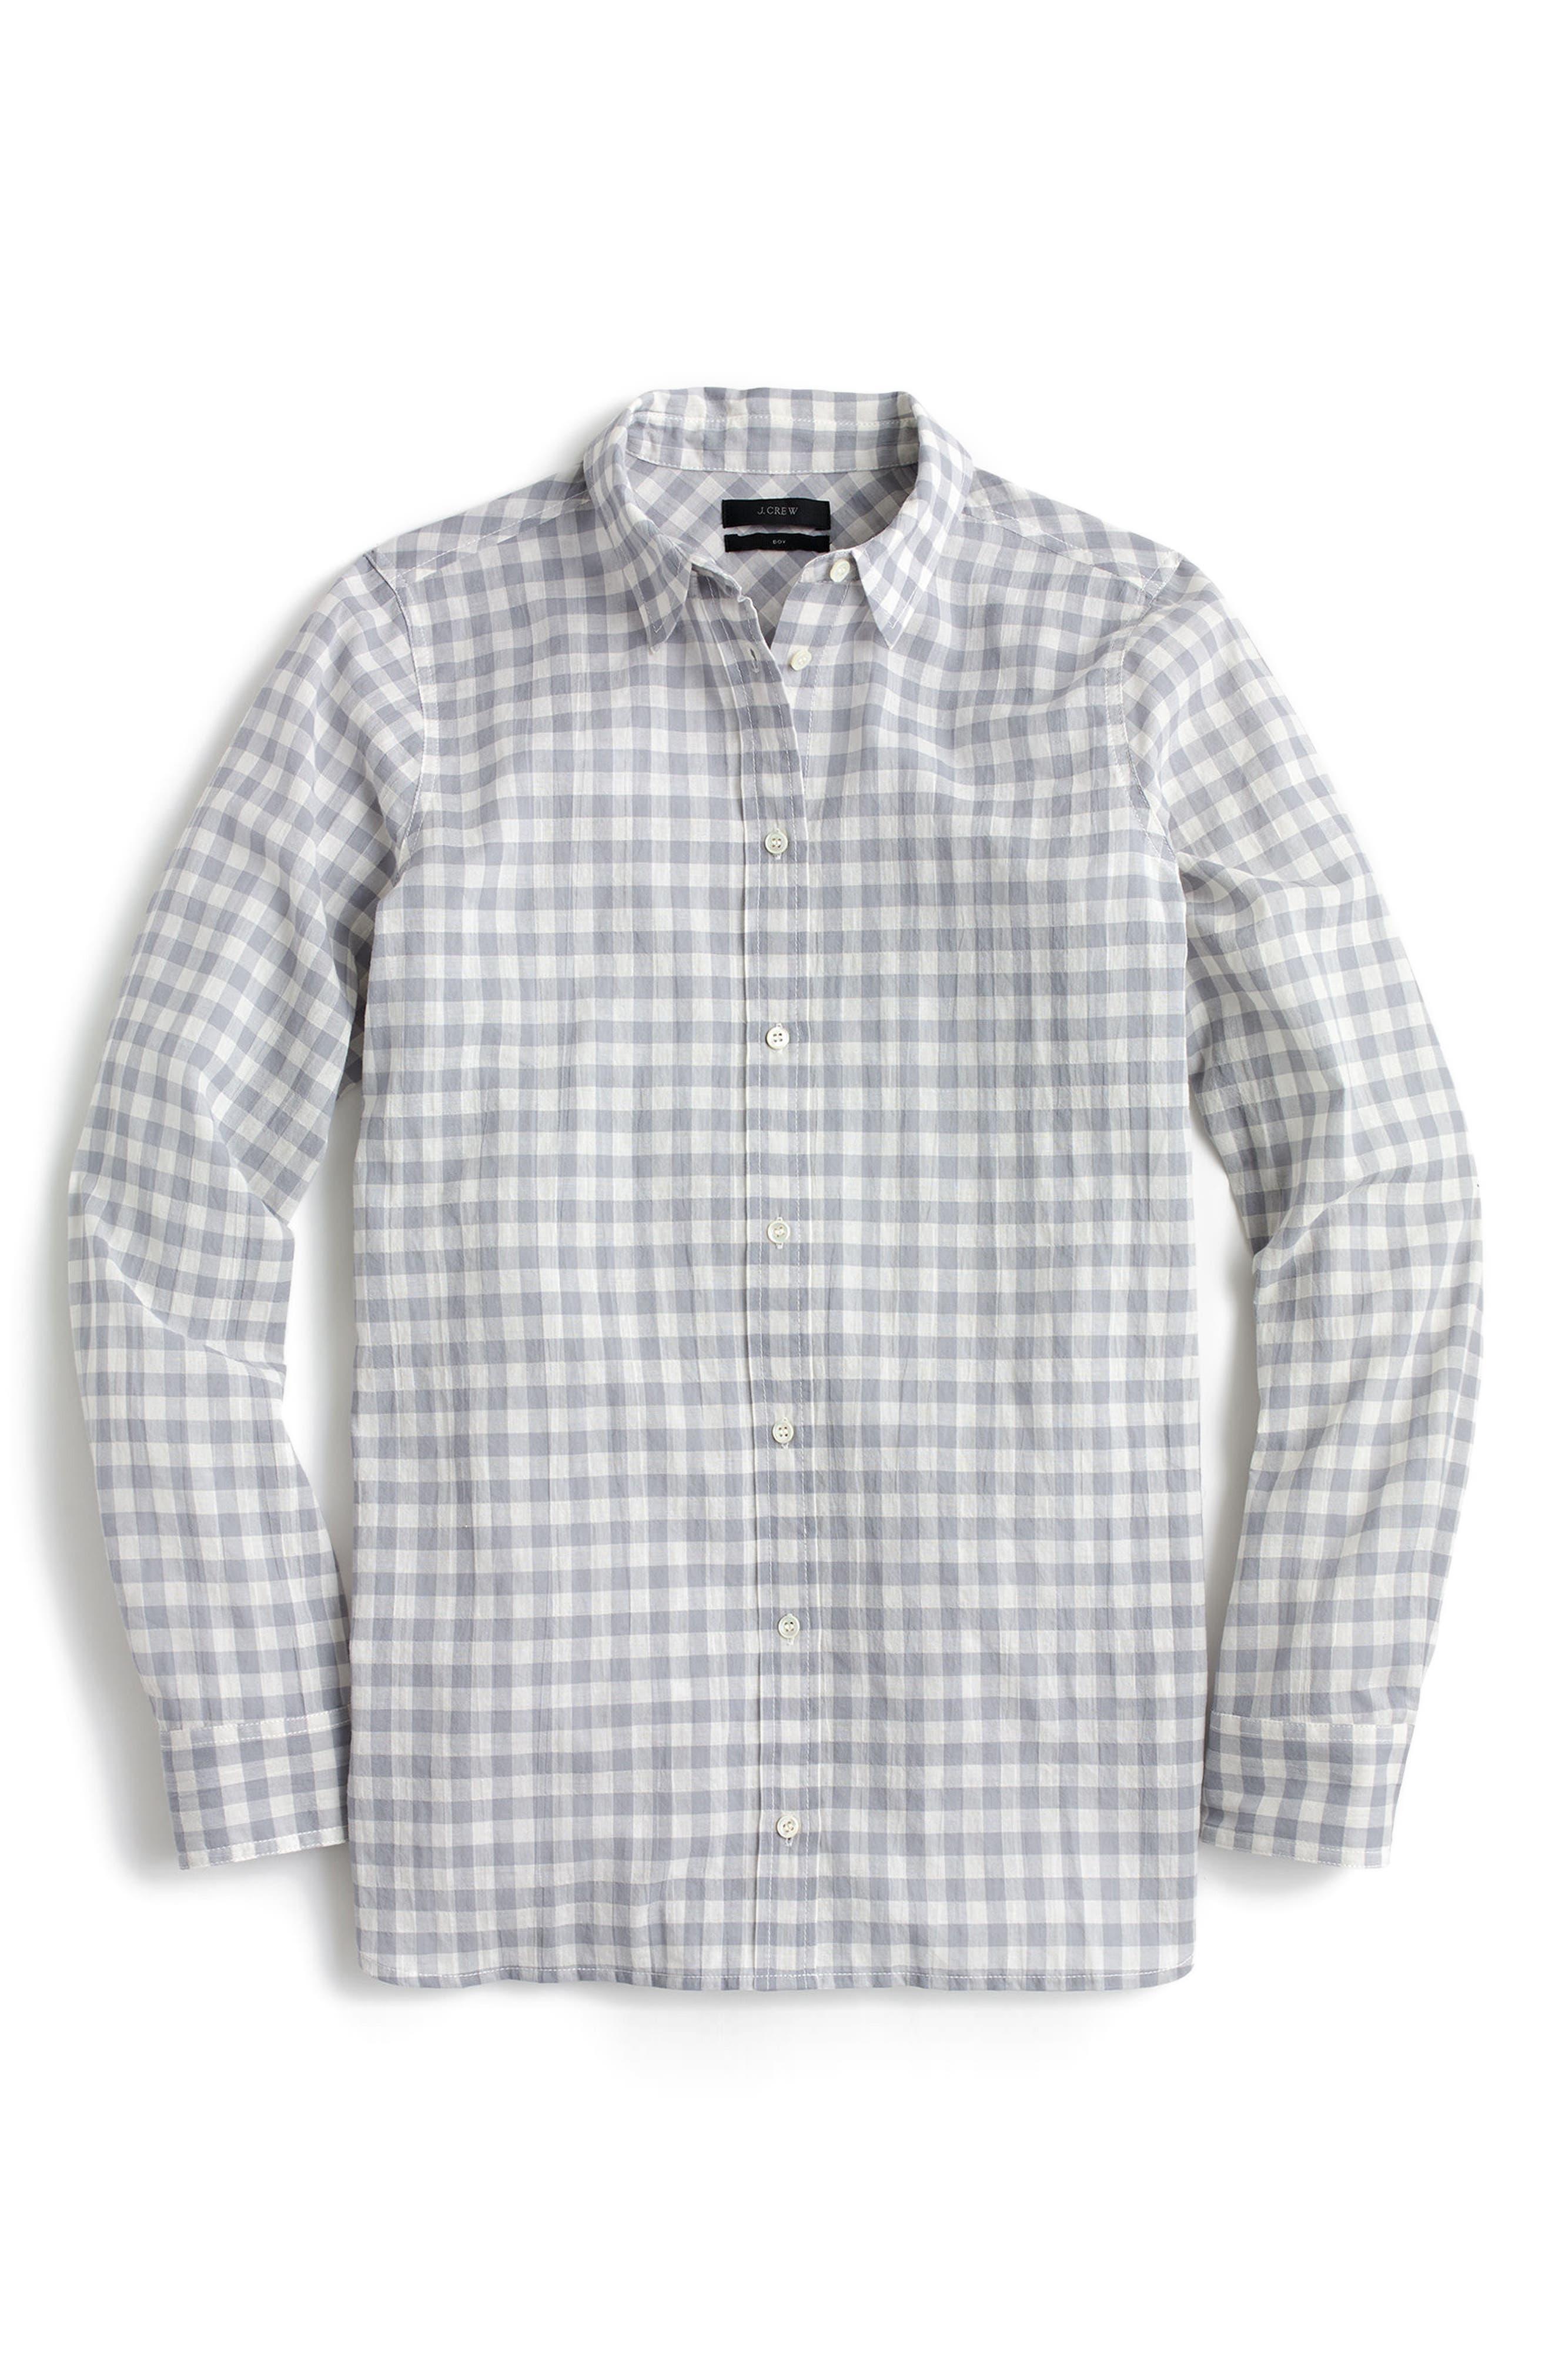 J.CREW, Crinkle Gingham Boy Shirt, Main thumbnail 1, color, 020